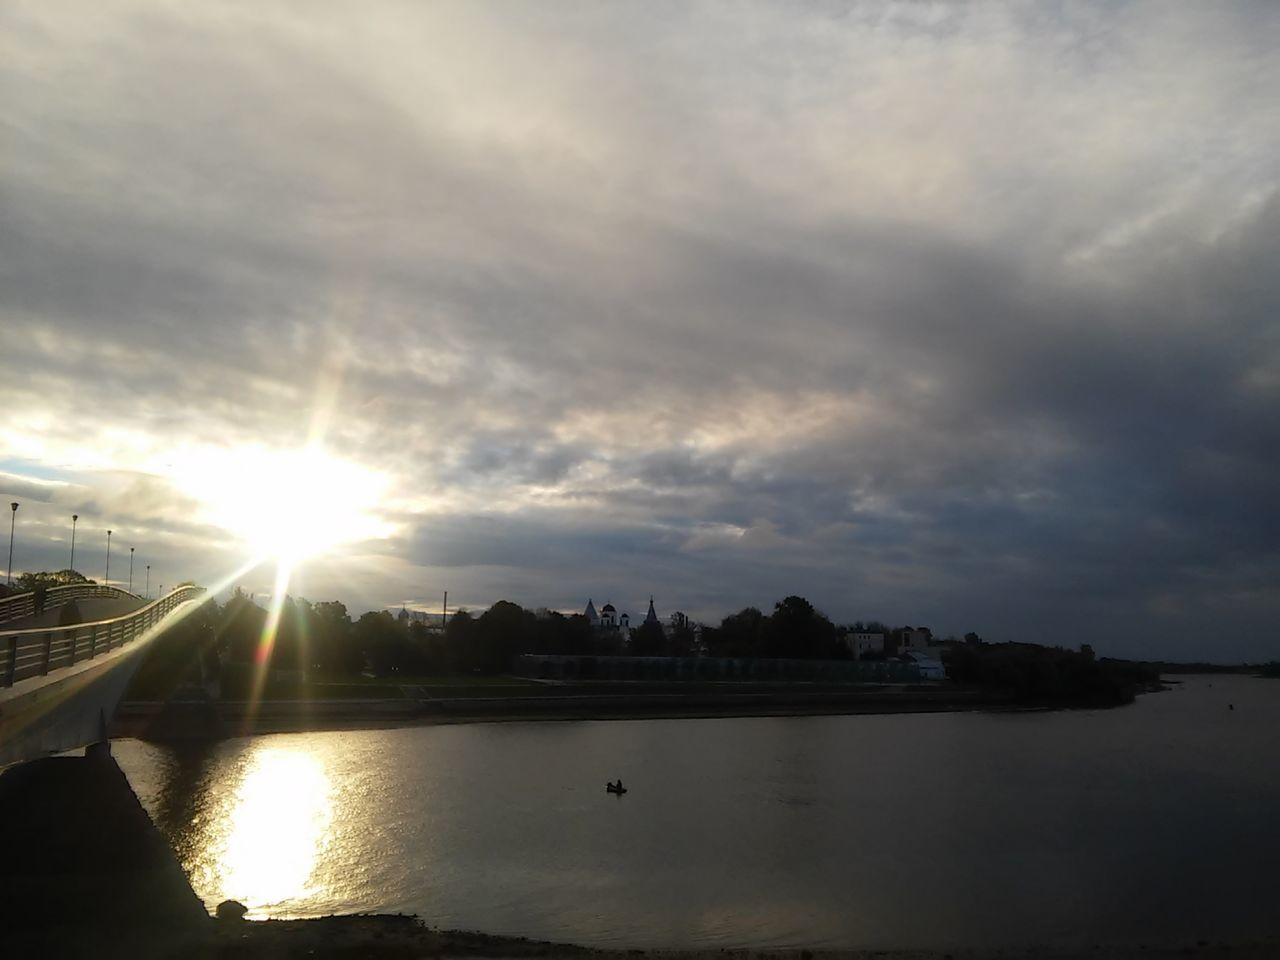 Clouds Nature Reflection River Sky Sun Velikiy Novgorod Water